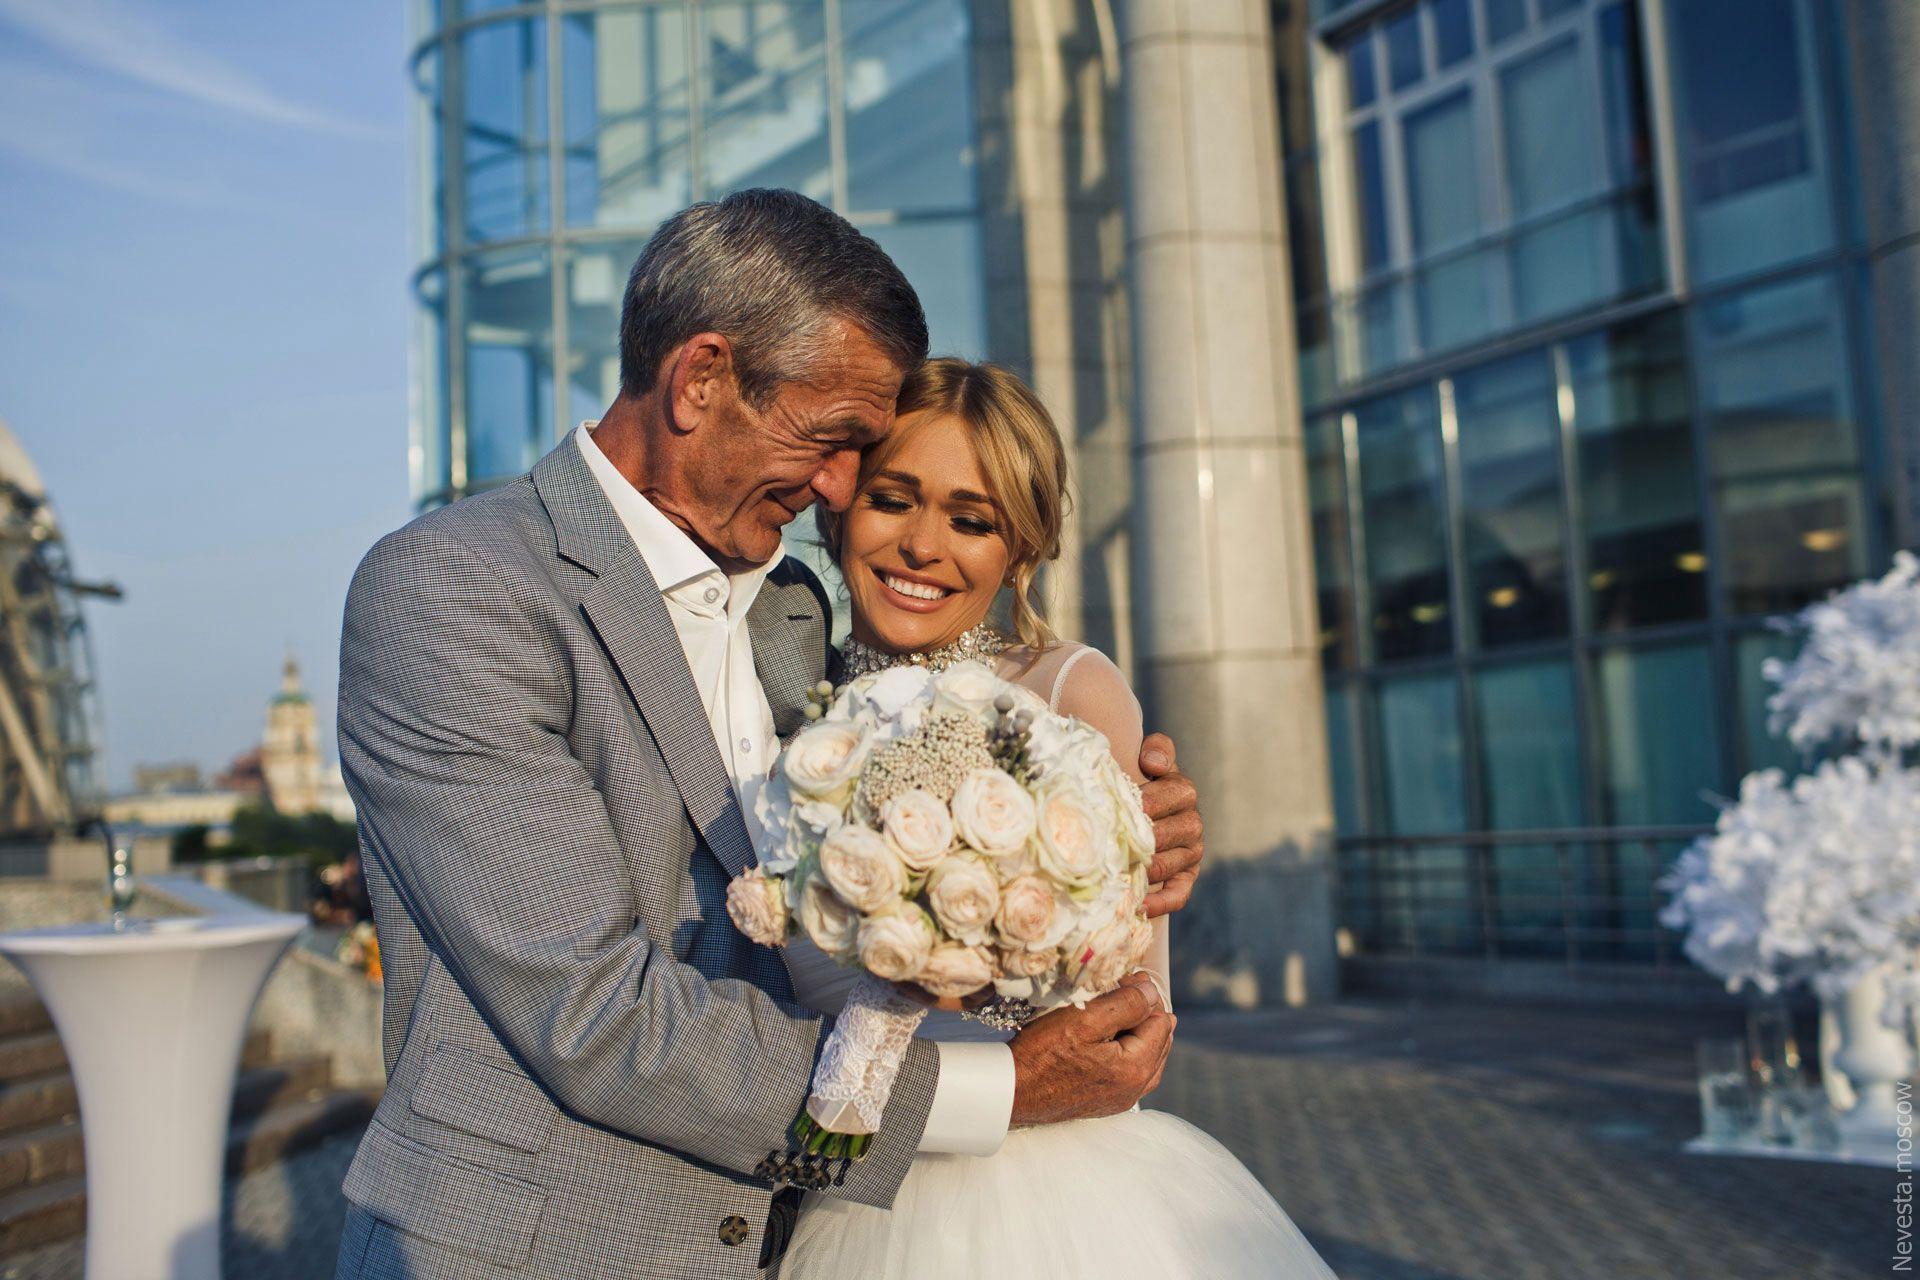 Свадьба Анны Хилькевич и Артура Волкова, фото 11